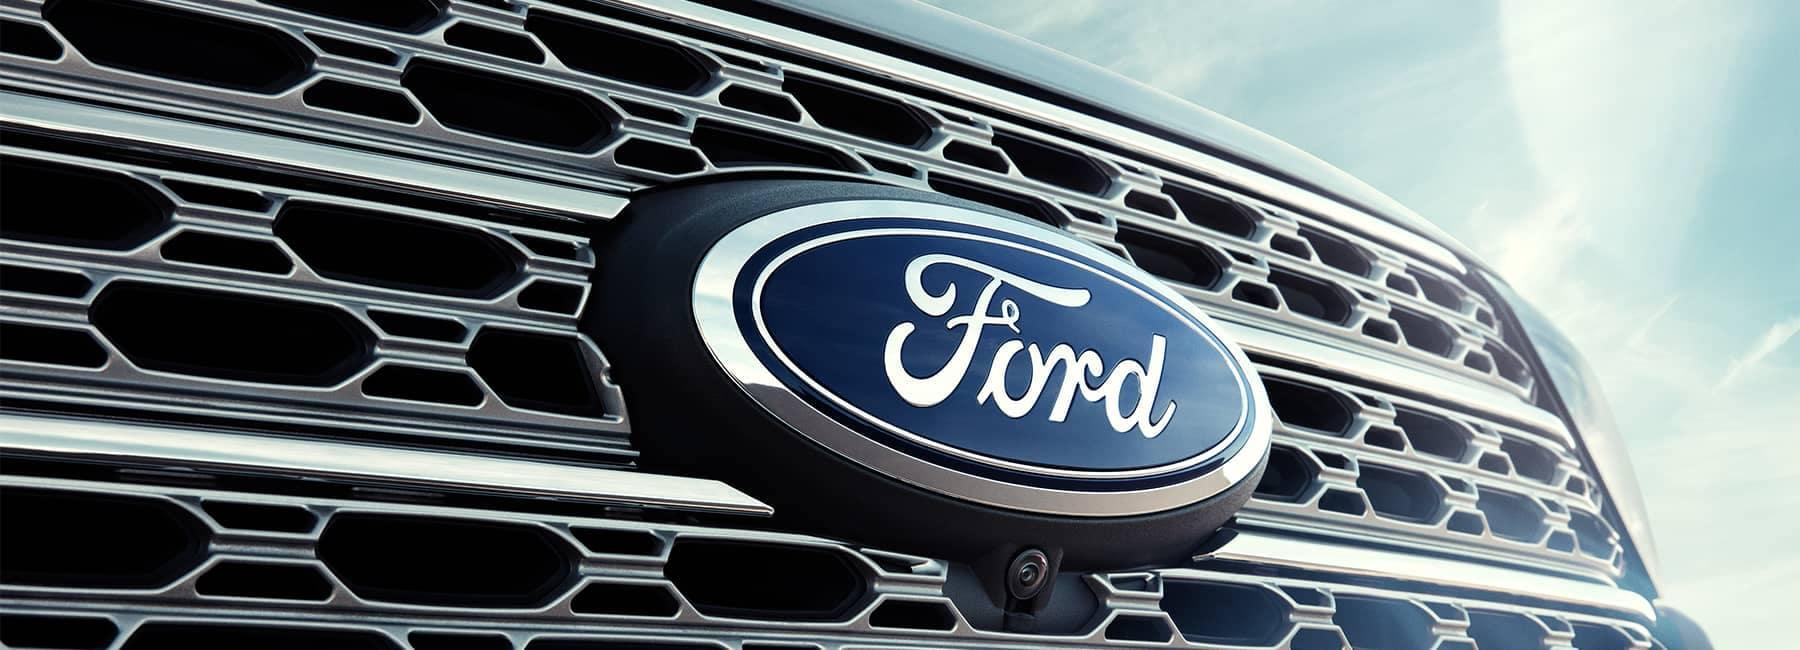 2021 Ford Explorer front grille